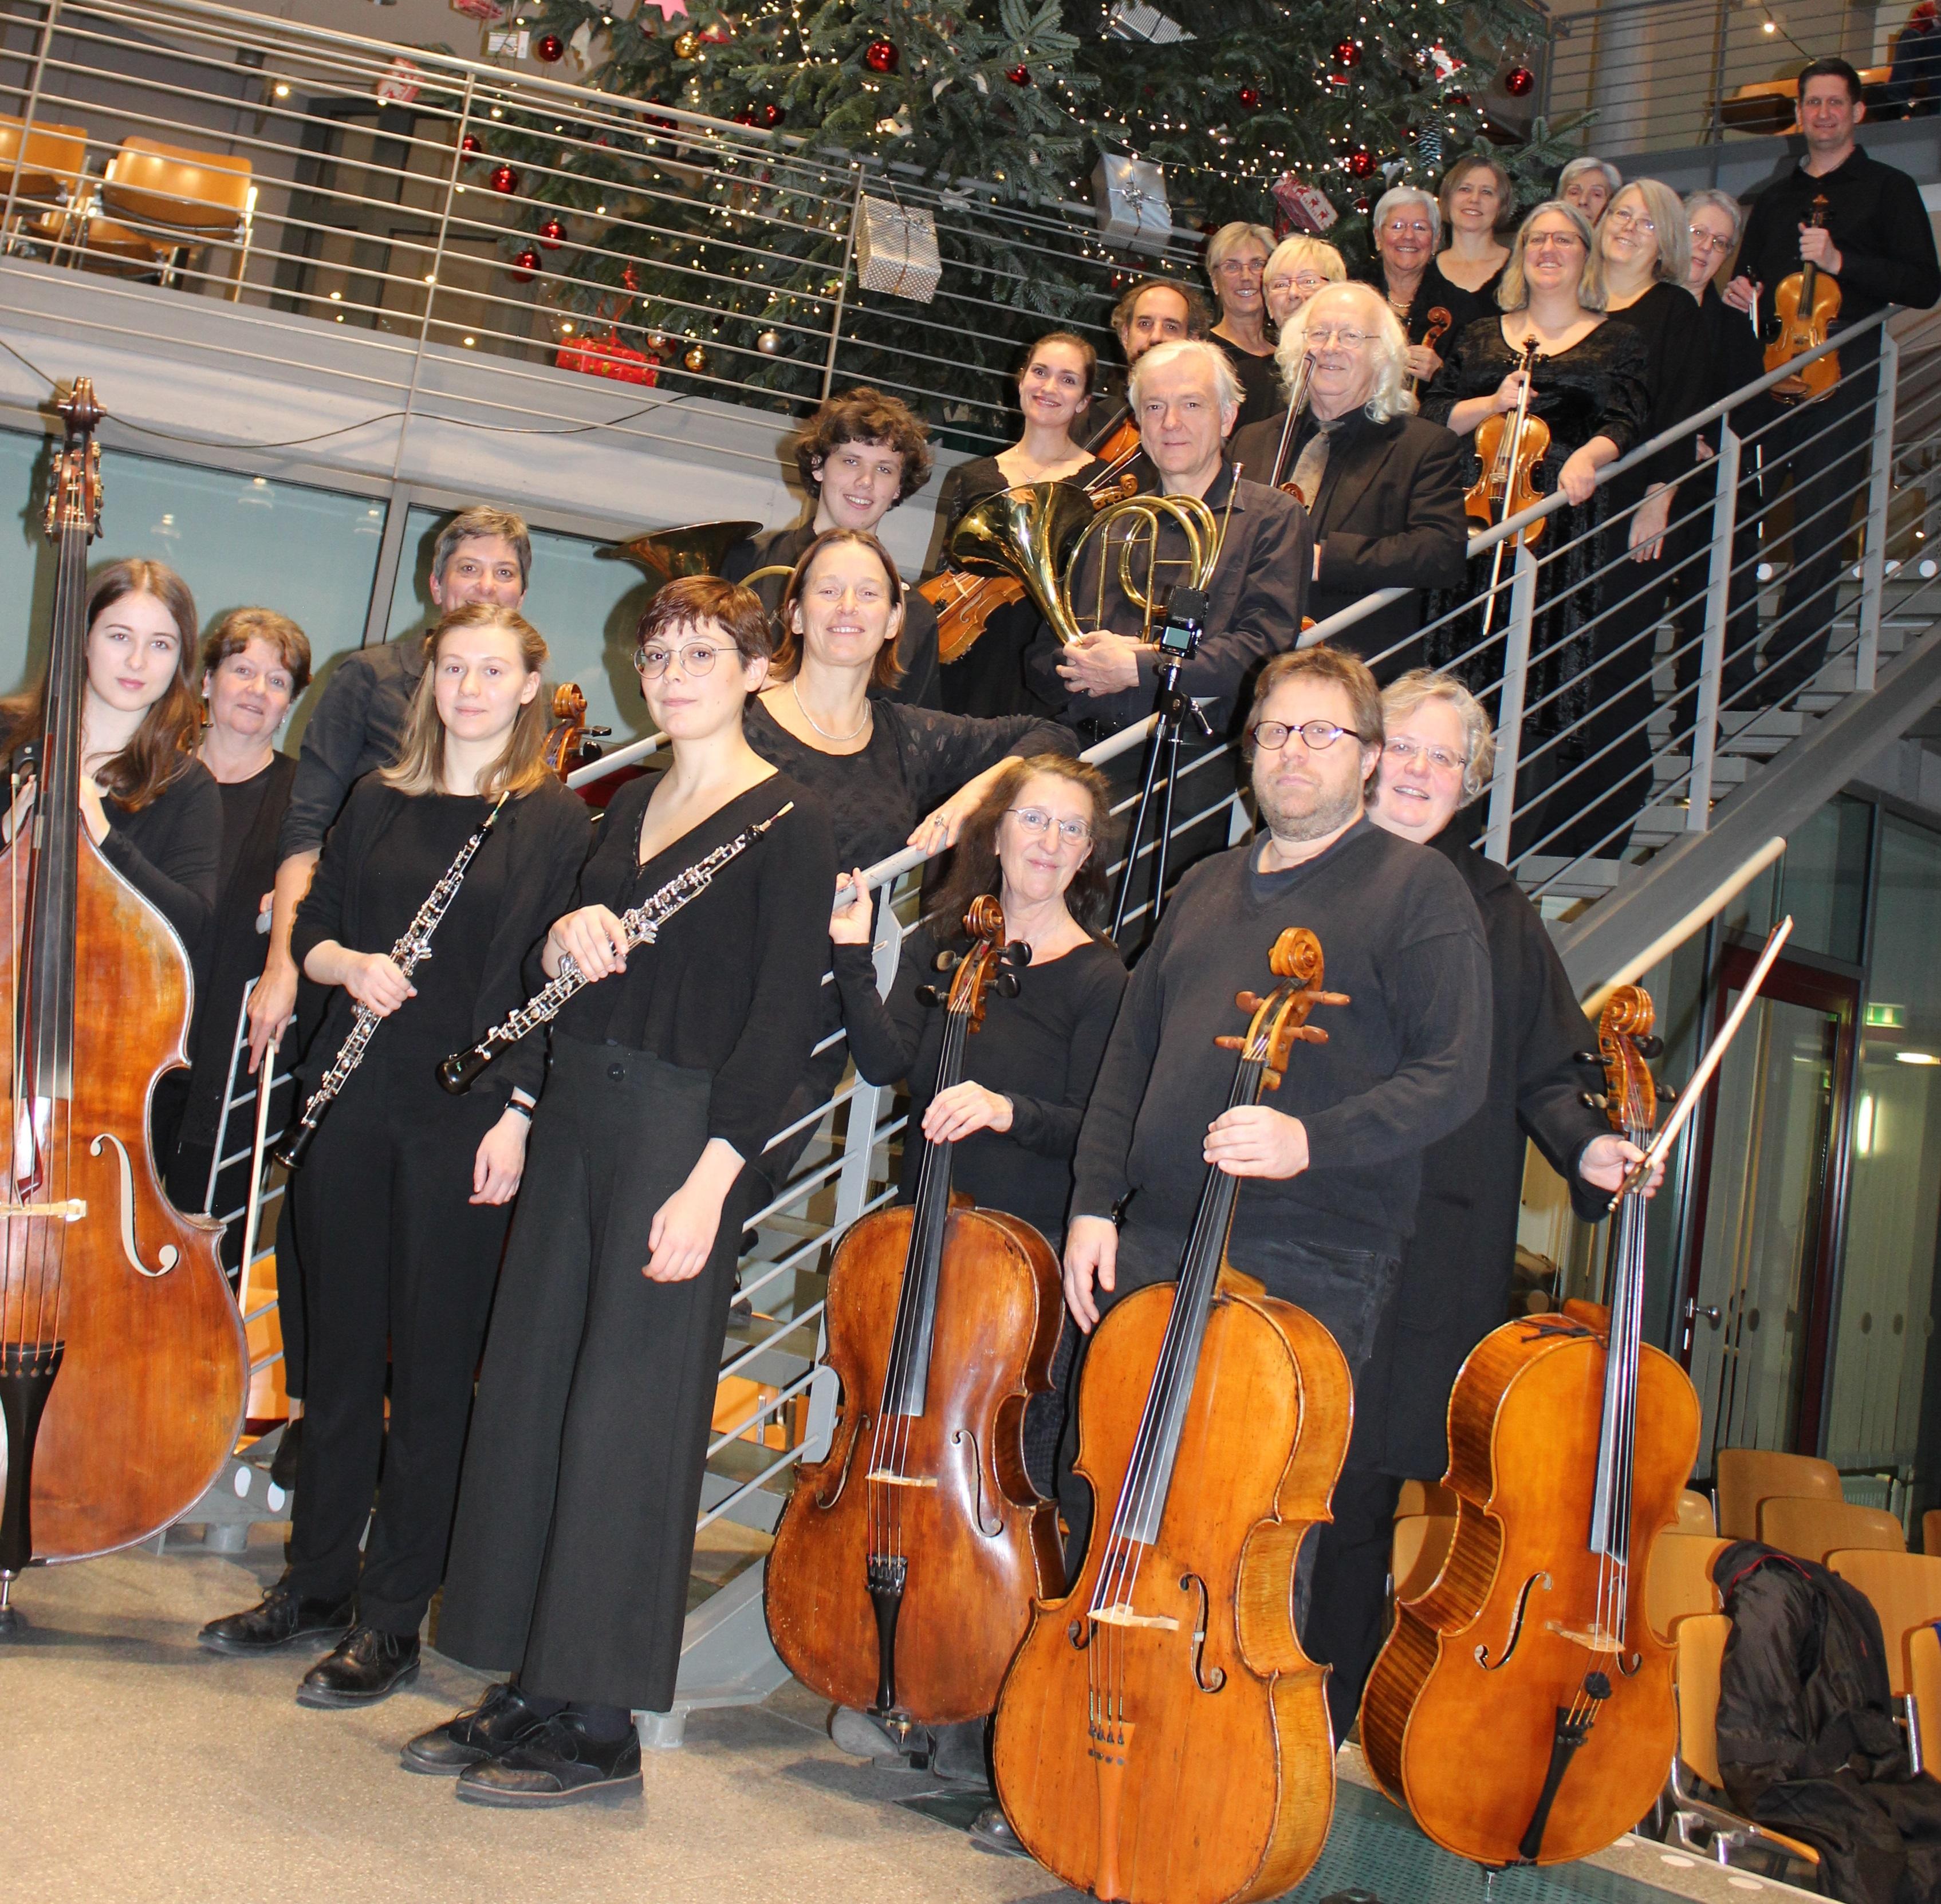 Jubiläumskonzert 30 Jahre Kammerorchester Kaarst Dezember 2019